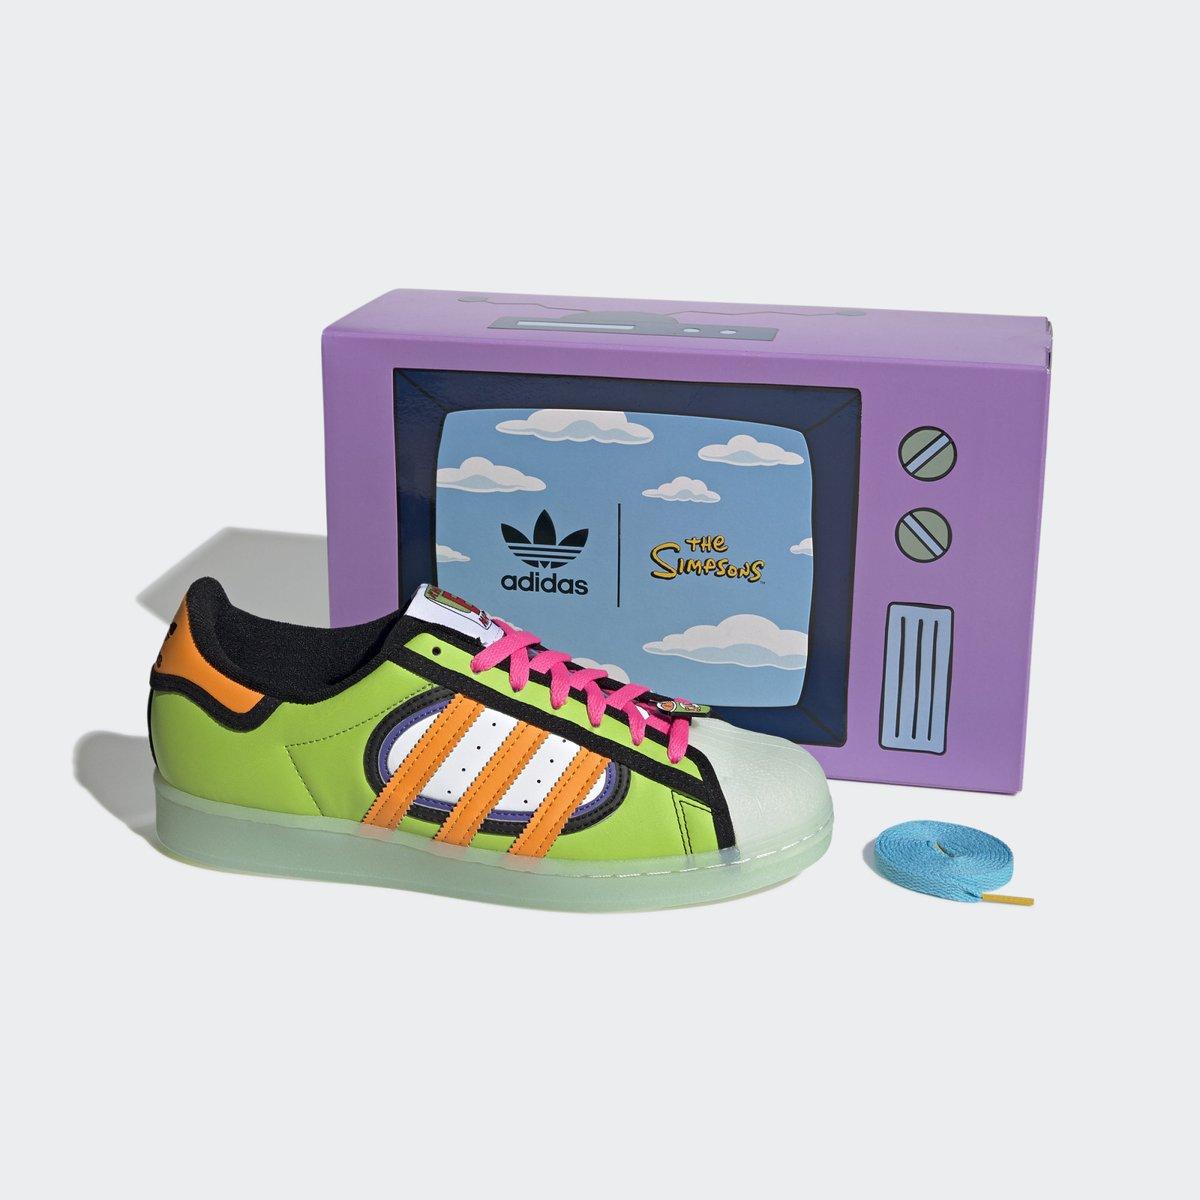 Restocked on @footlocker. @TheSimpsons x adidas Superstar. —